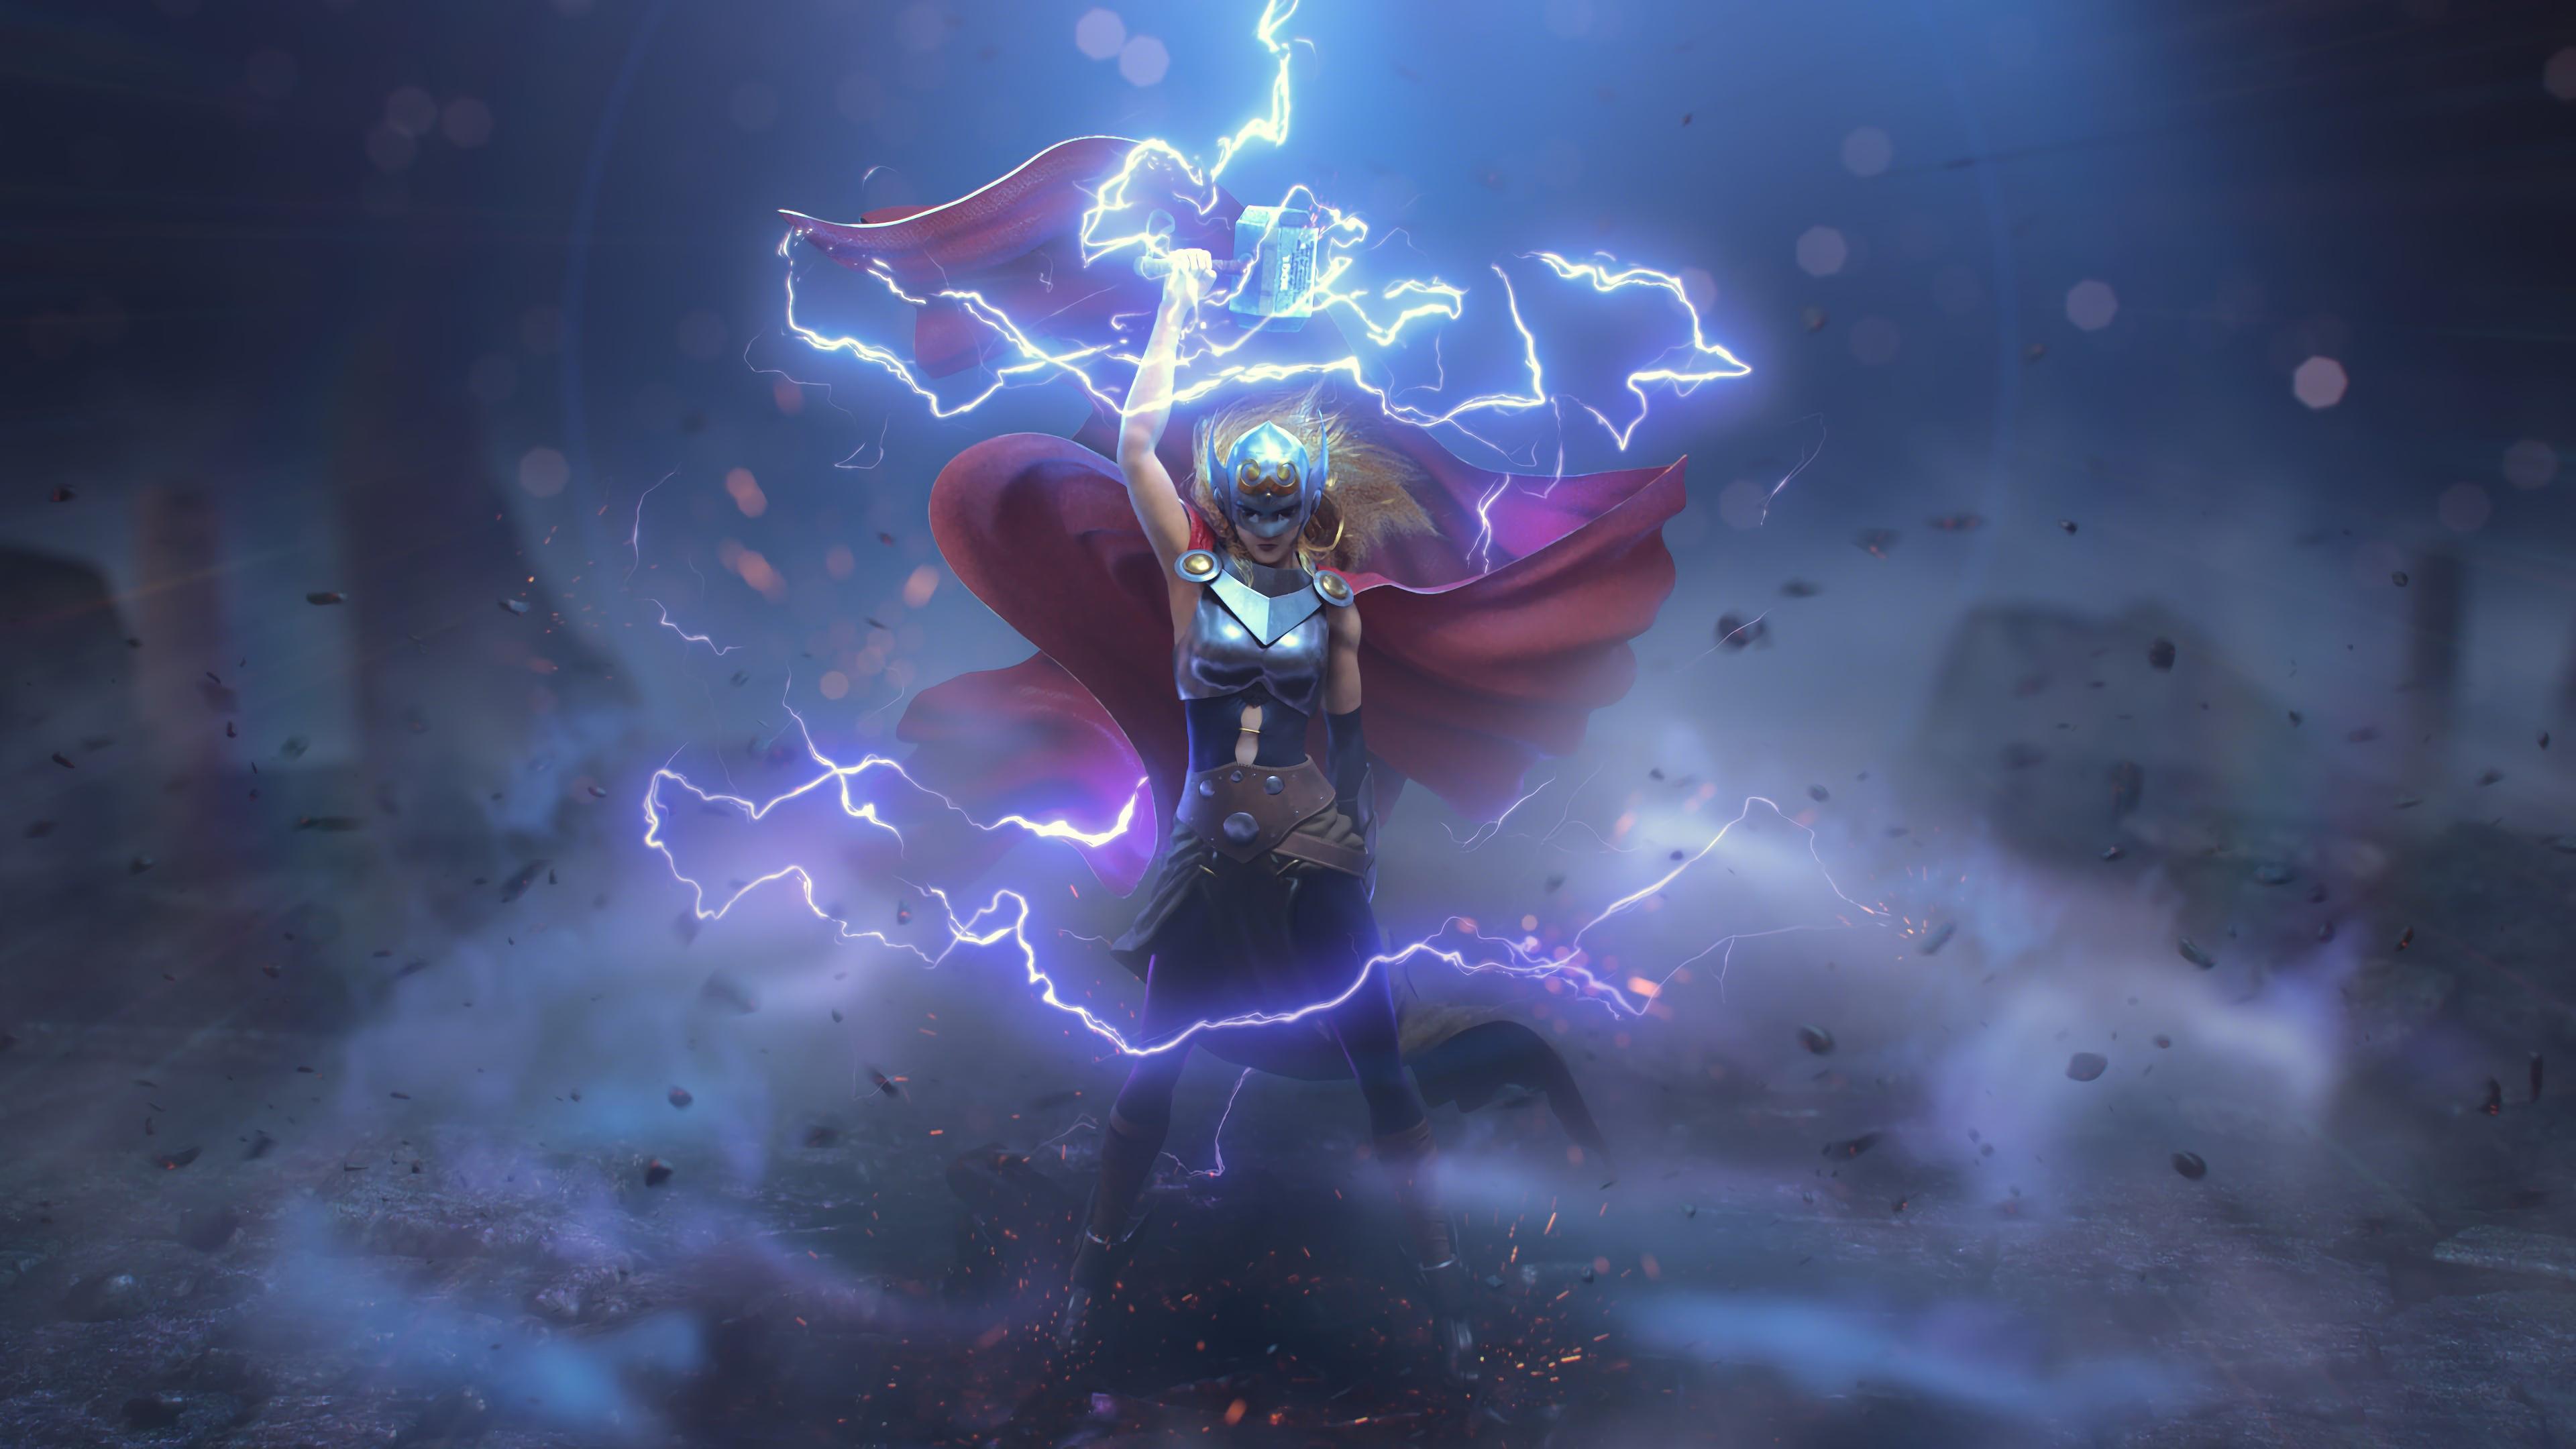 Jane Foster Thor - Thor Art - HD Wallpaper